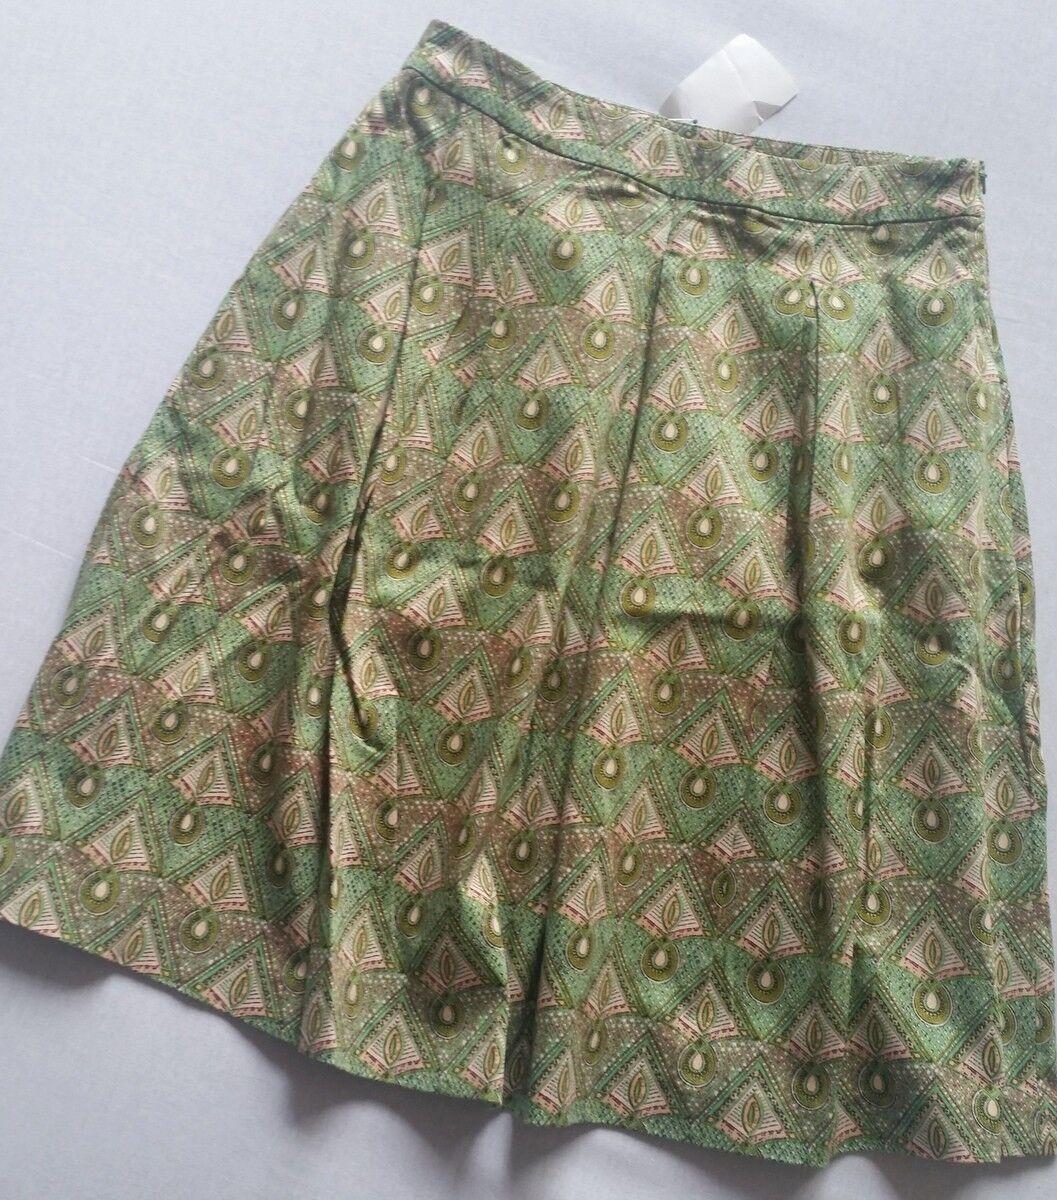 Hallhuber Skirt Pleats Green Multicolour Size 34 New